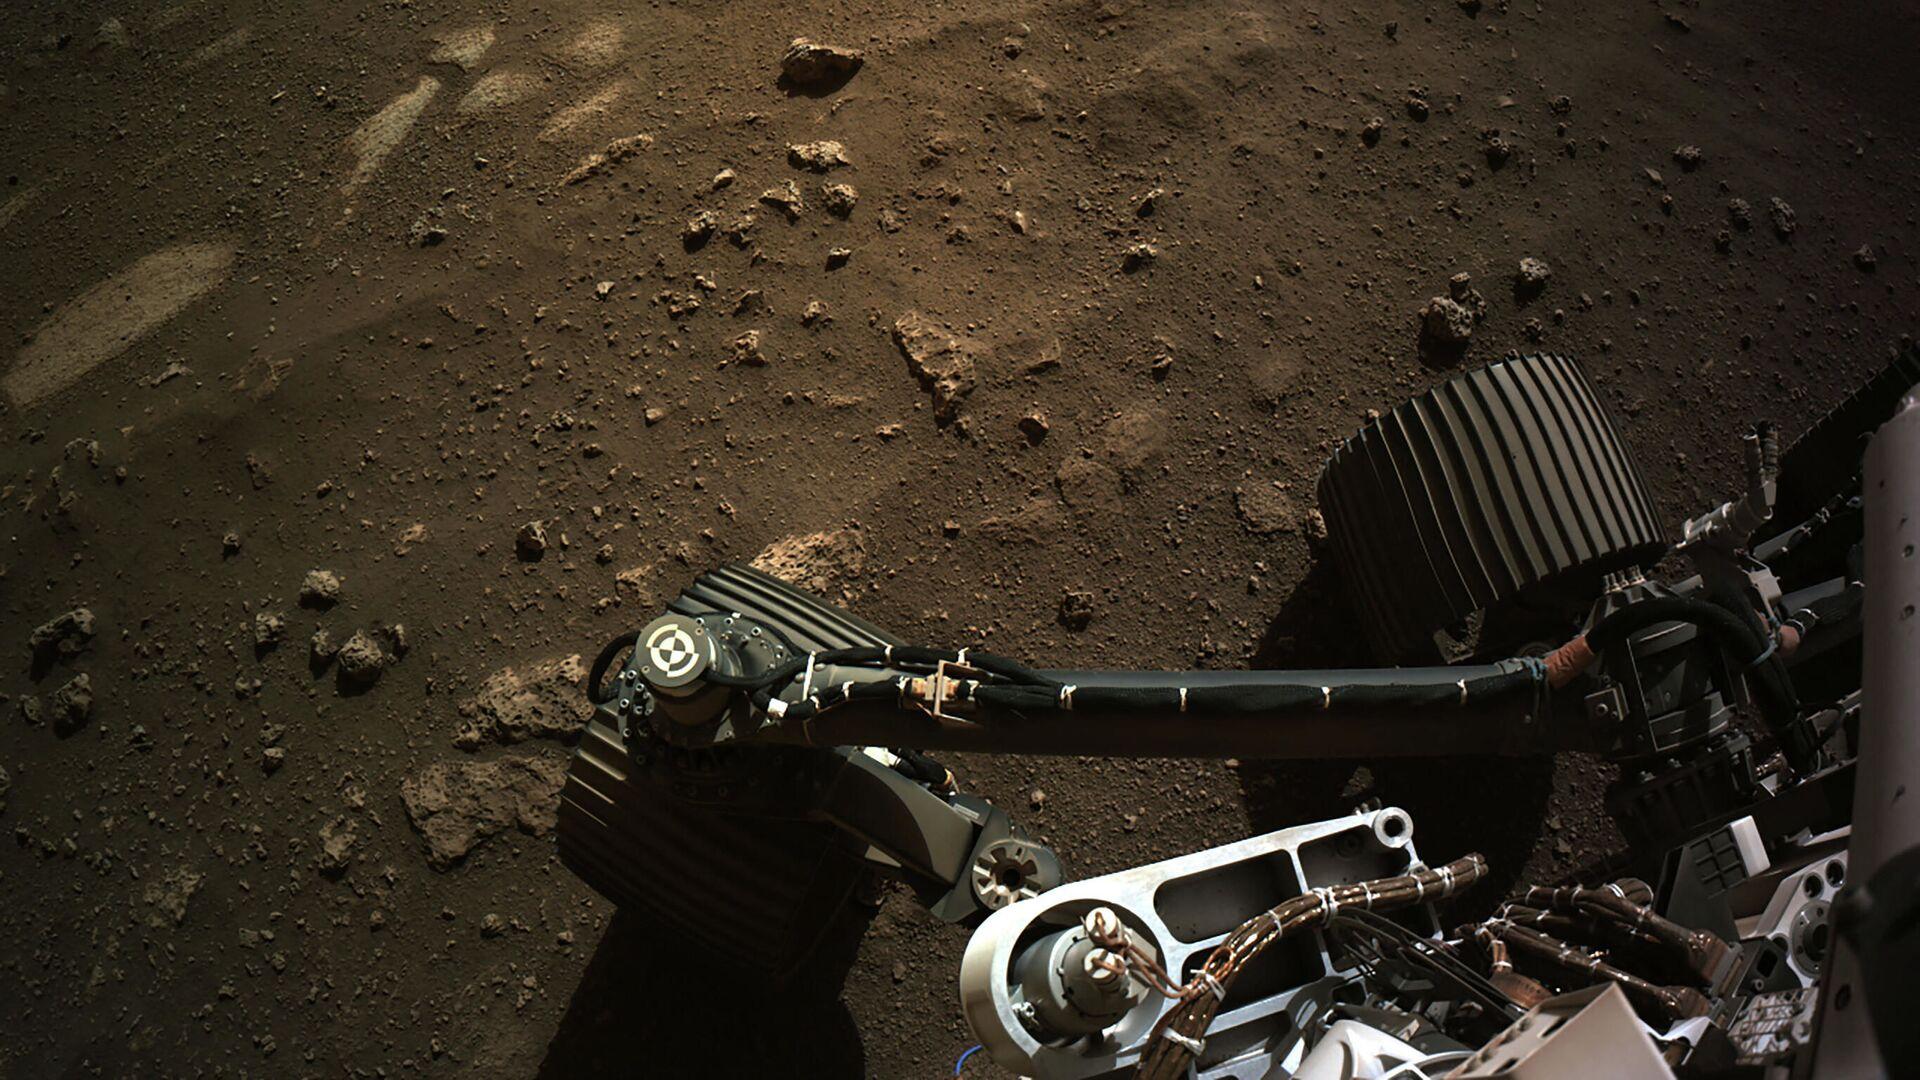 Вид с навигационной камеры на марсоход Perseverance Mars Rover - Sputnik Česká republika, 1920, 25.04.2021